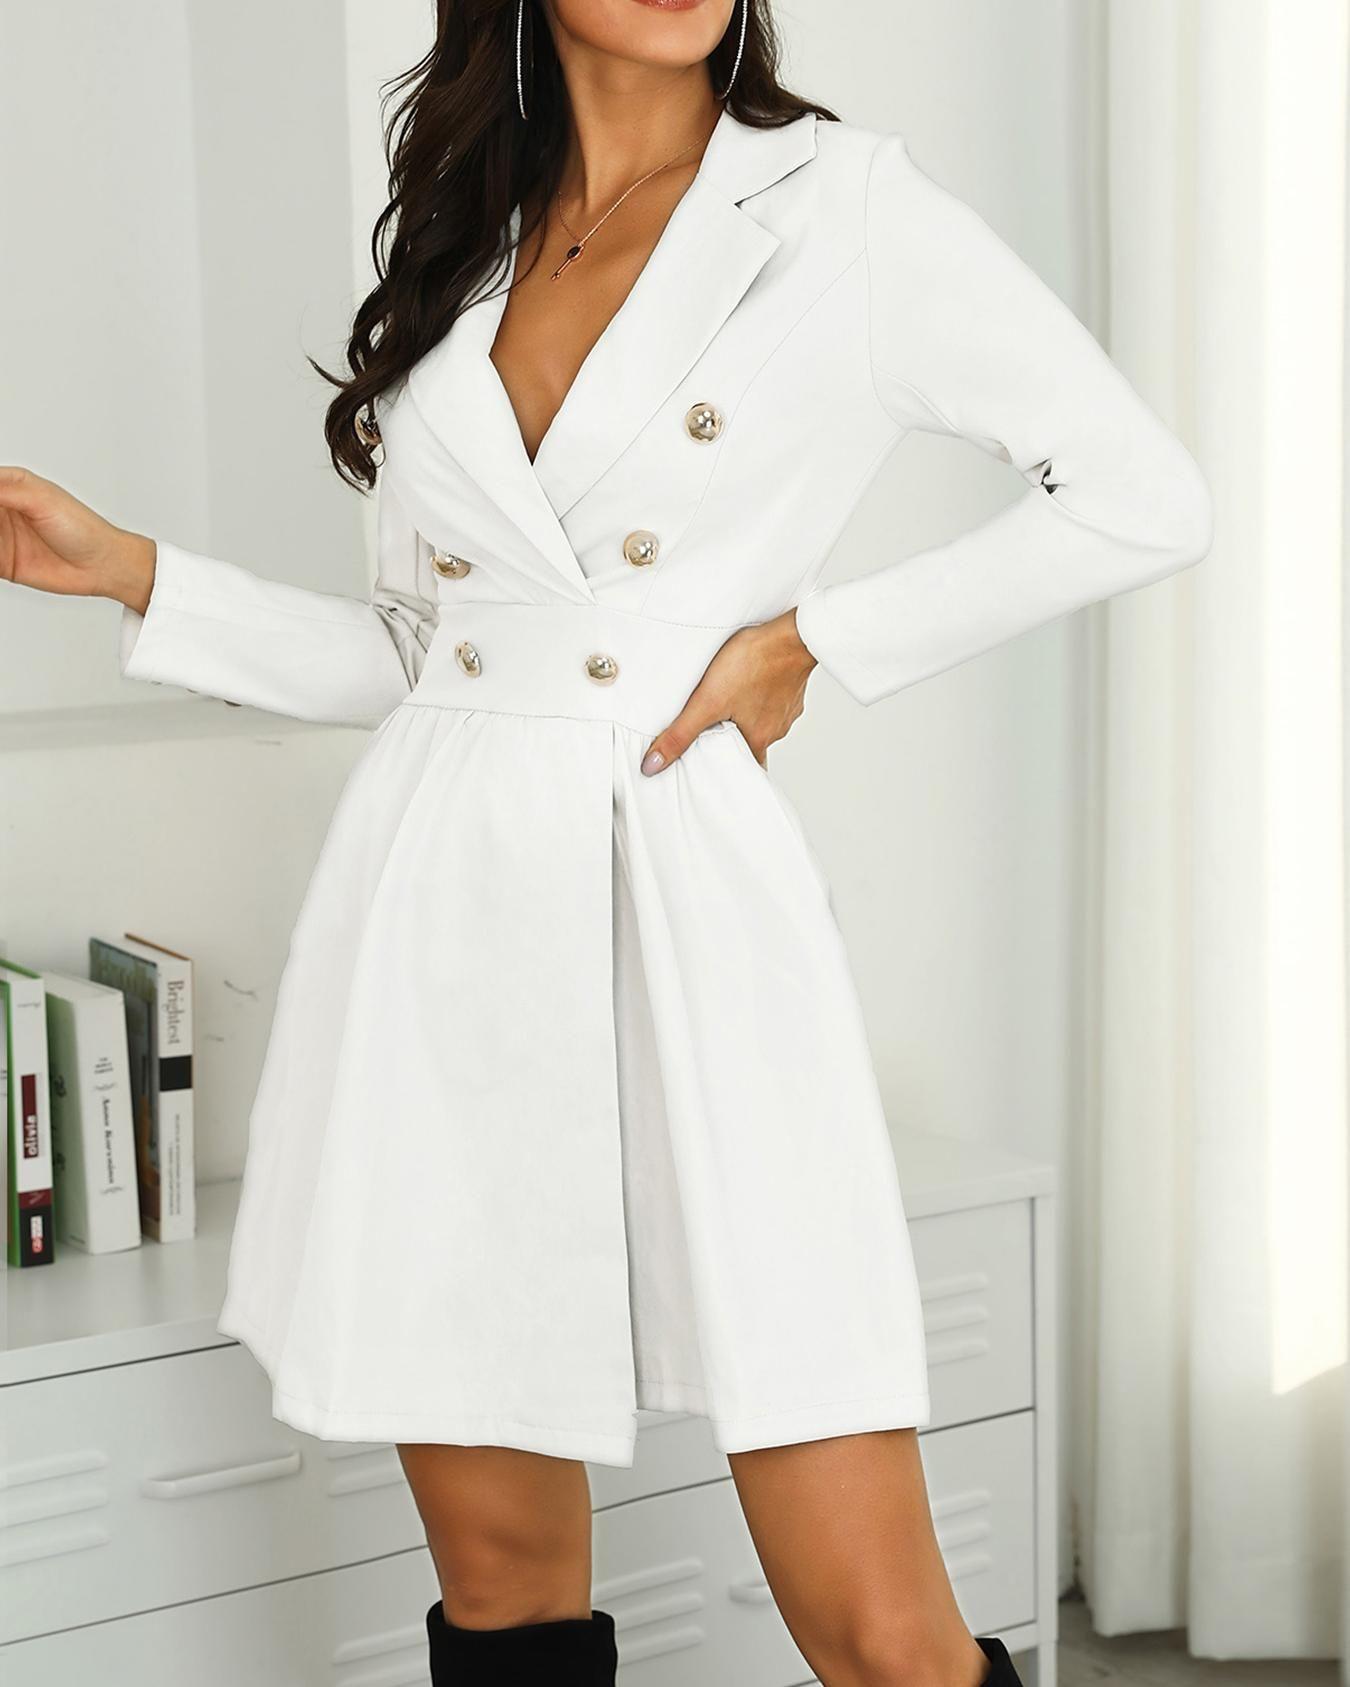 Long Sleeve Button Design Blazer Dress S M L Xl 37 99 Blazer Dress Long Sleeve Dress Fashion Outfits [ 1687 x 1350 Pixel ]